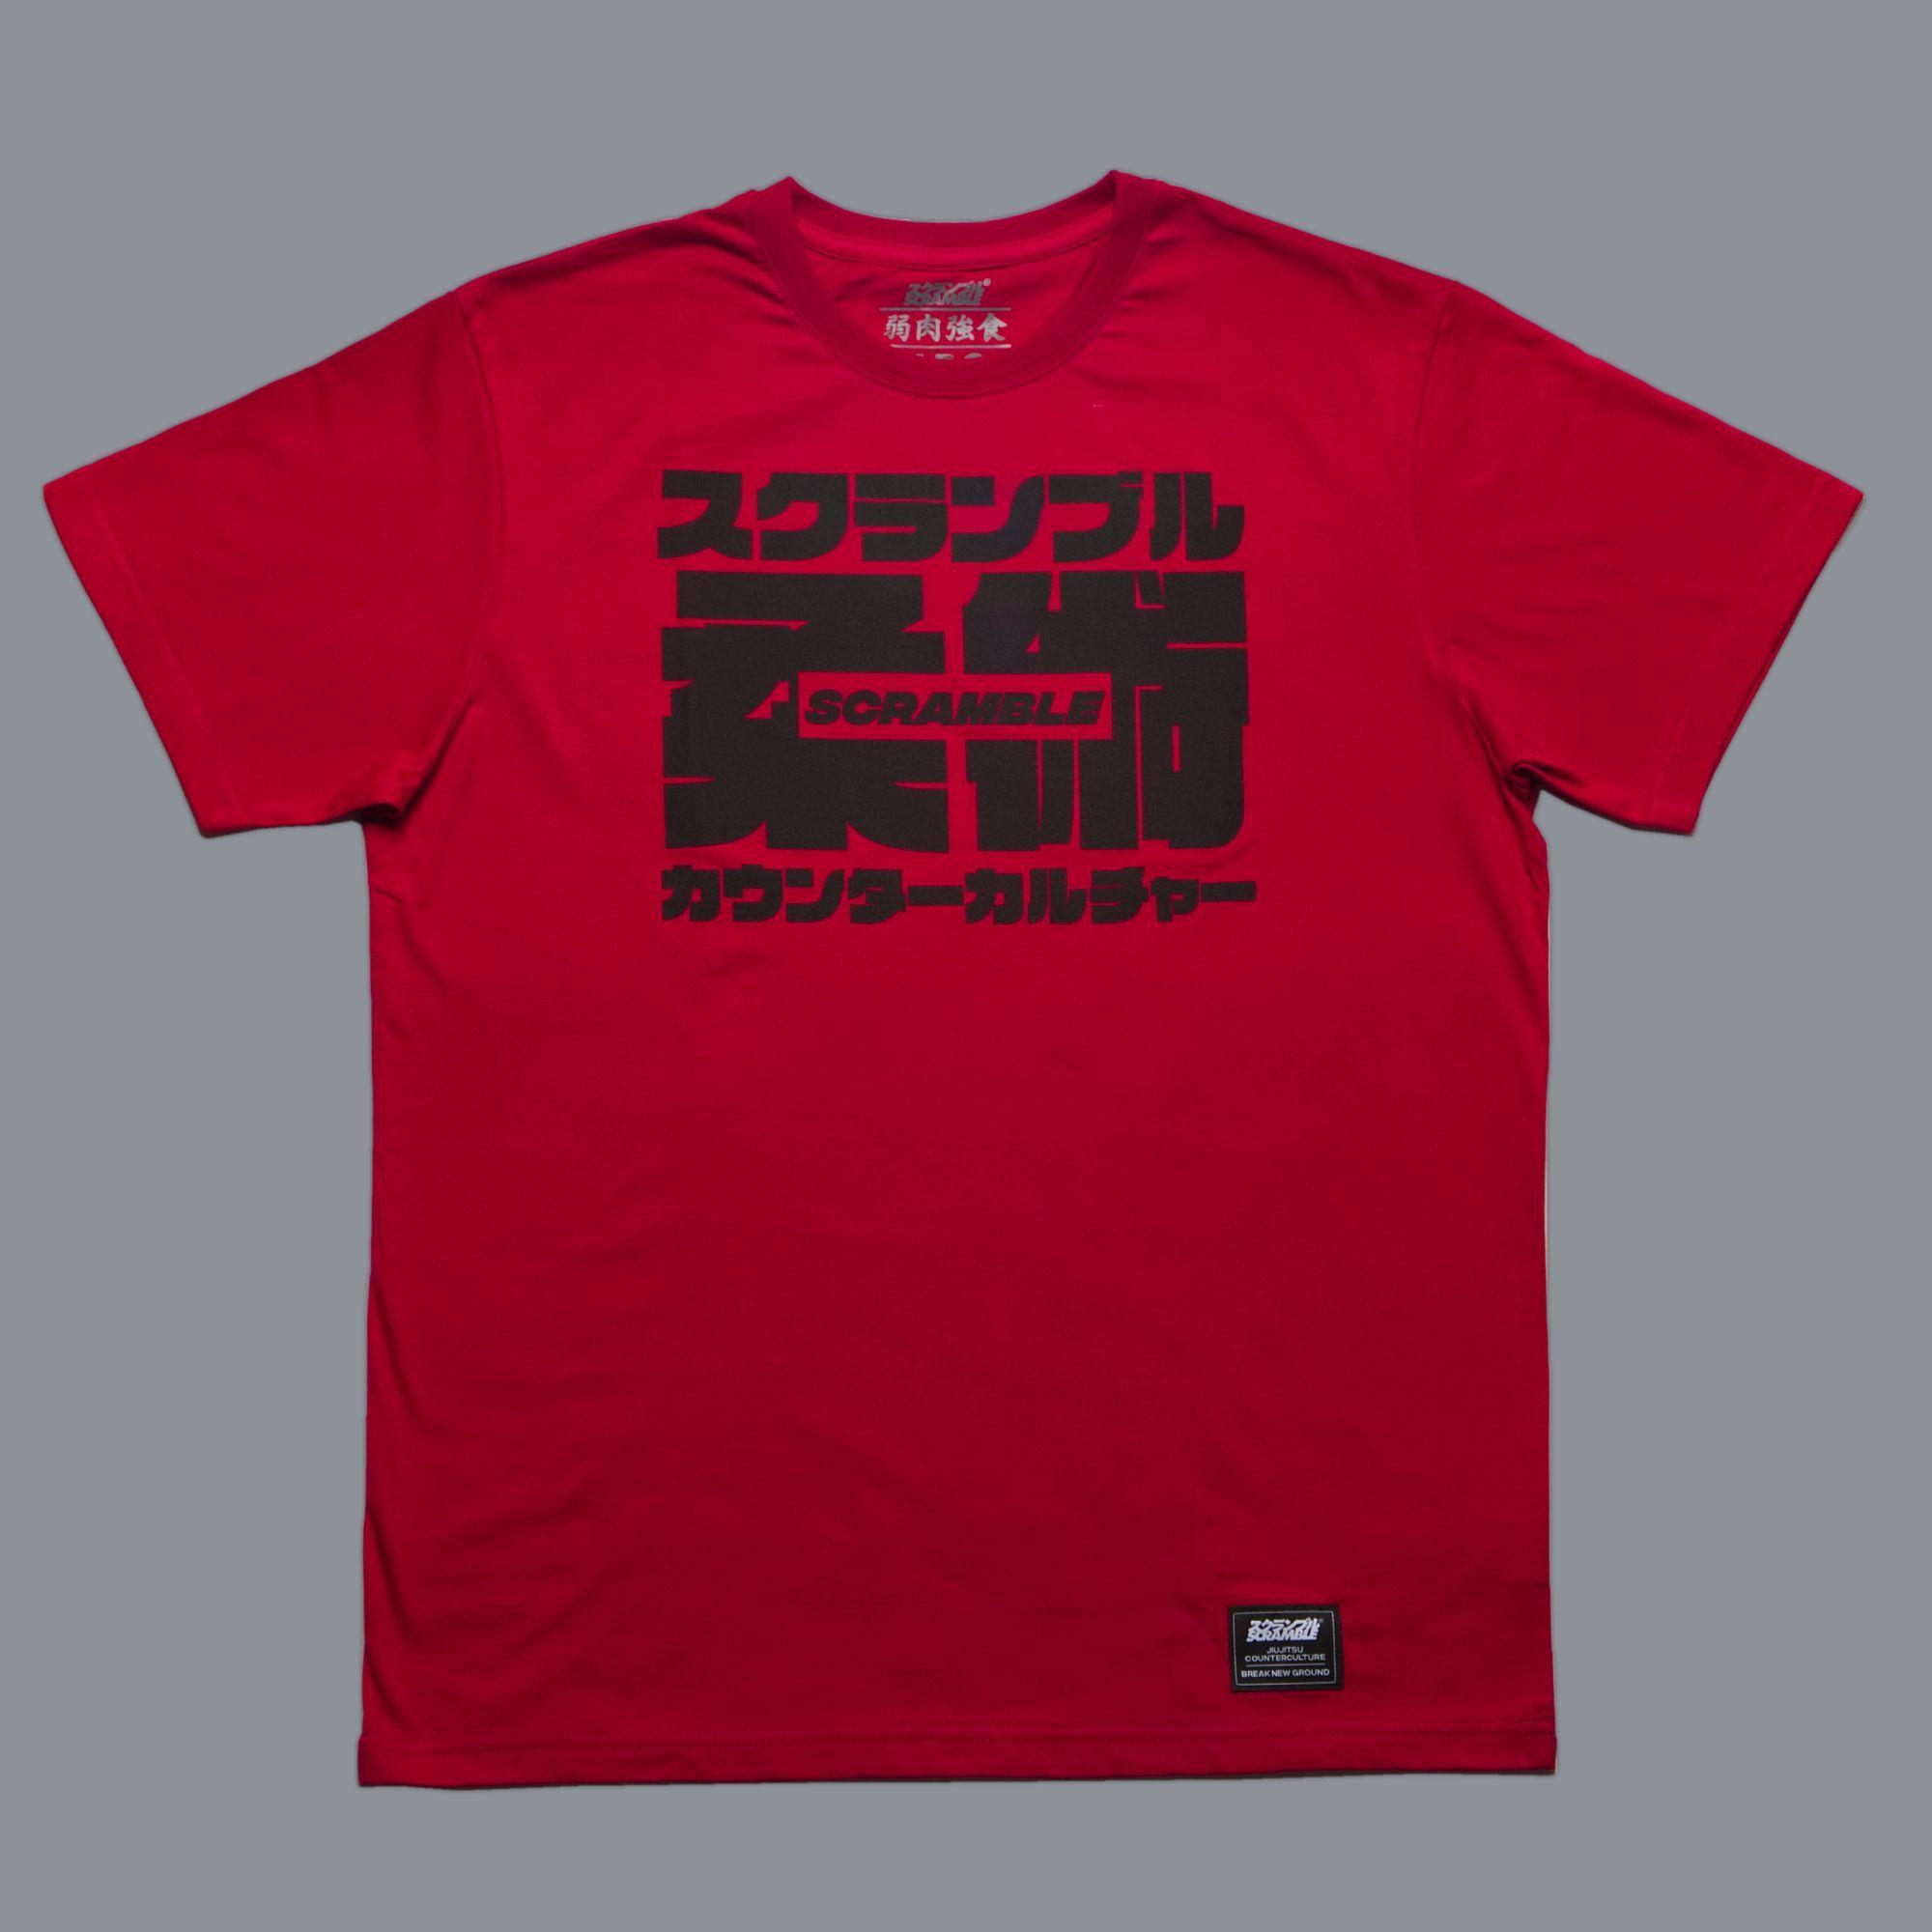 SCRAMBLE BIG KANJI Tシャツ